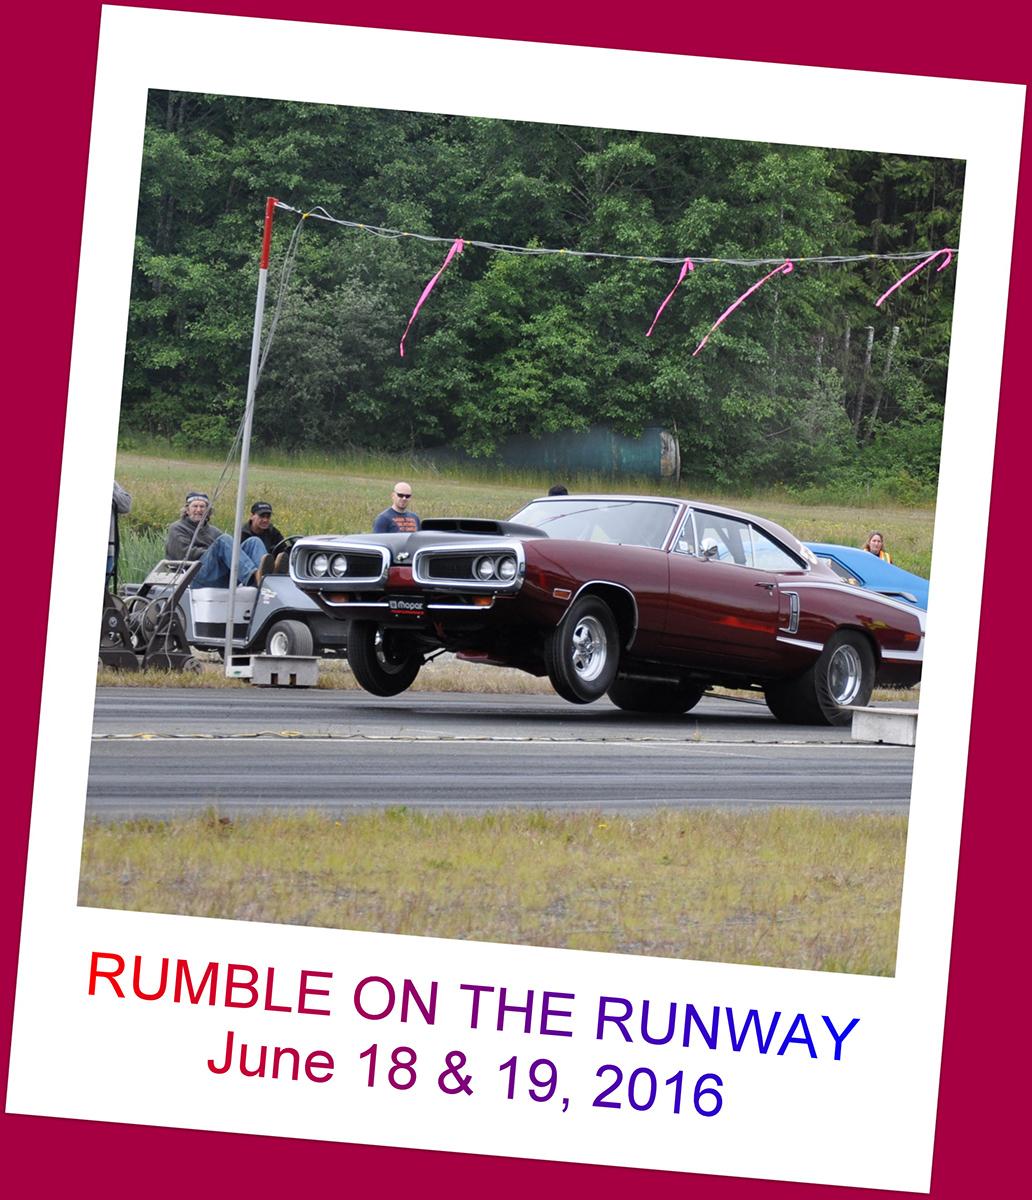 Rumble on the Runway June 18 & 19, 2016 1140